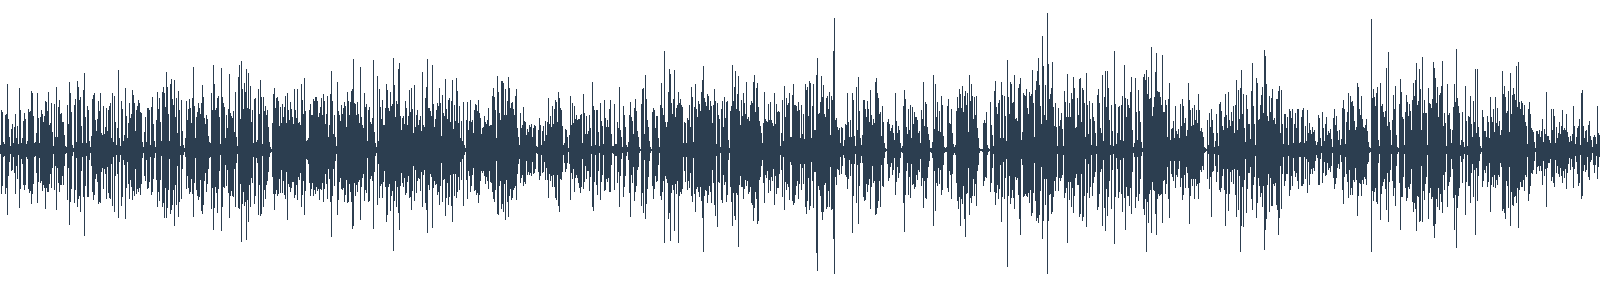 Reparát po Golgote waveform